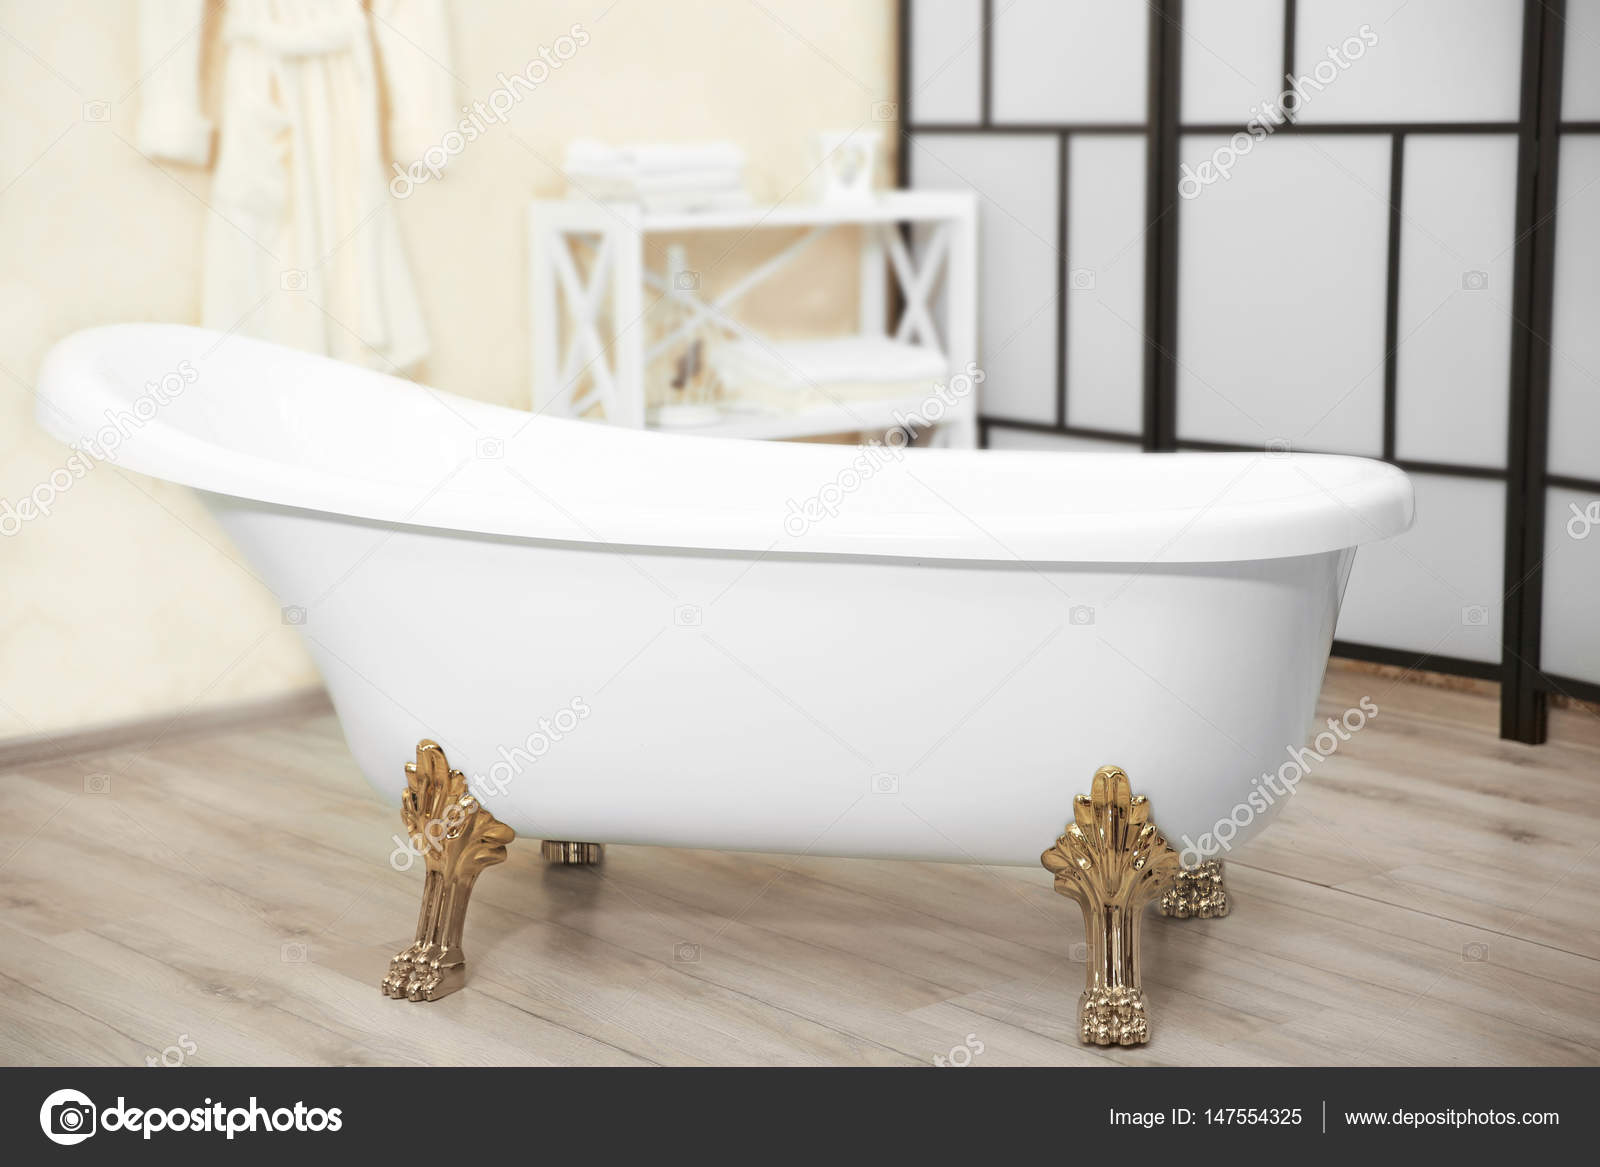 https://st3.depositphotos.com/1177973/14755/i/1600/depositphotos_147554325-stockafbeelding-interieur-van-mooie-badkamer.jpg